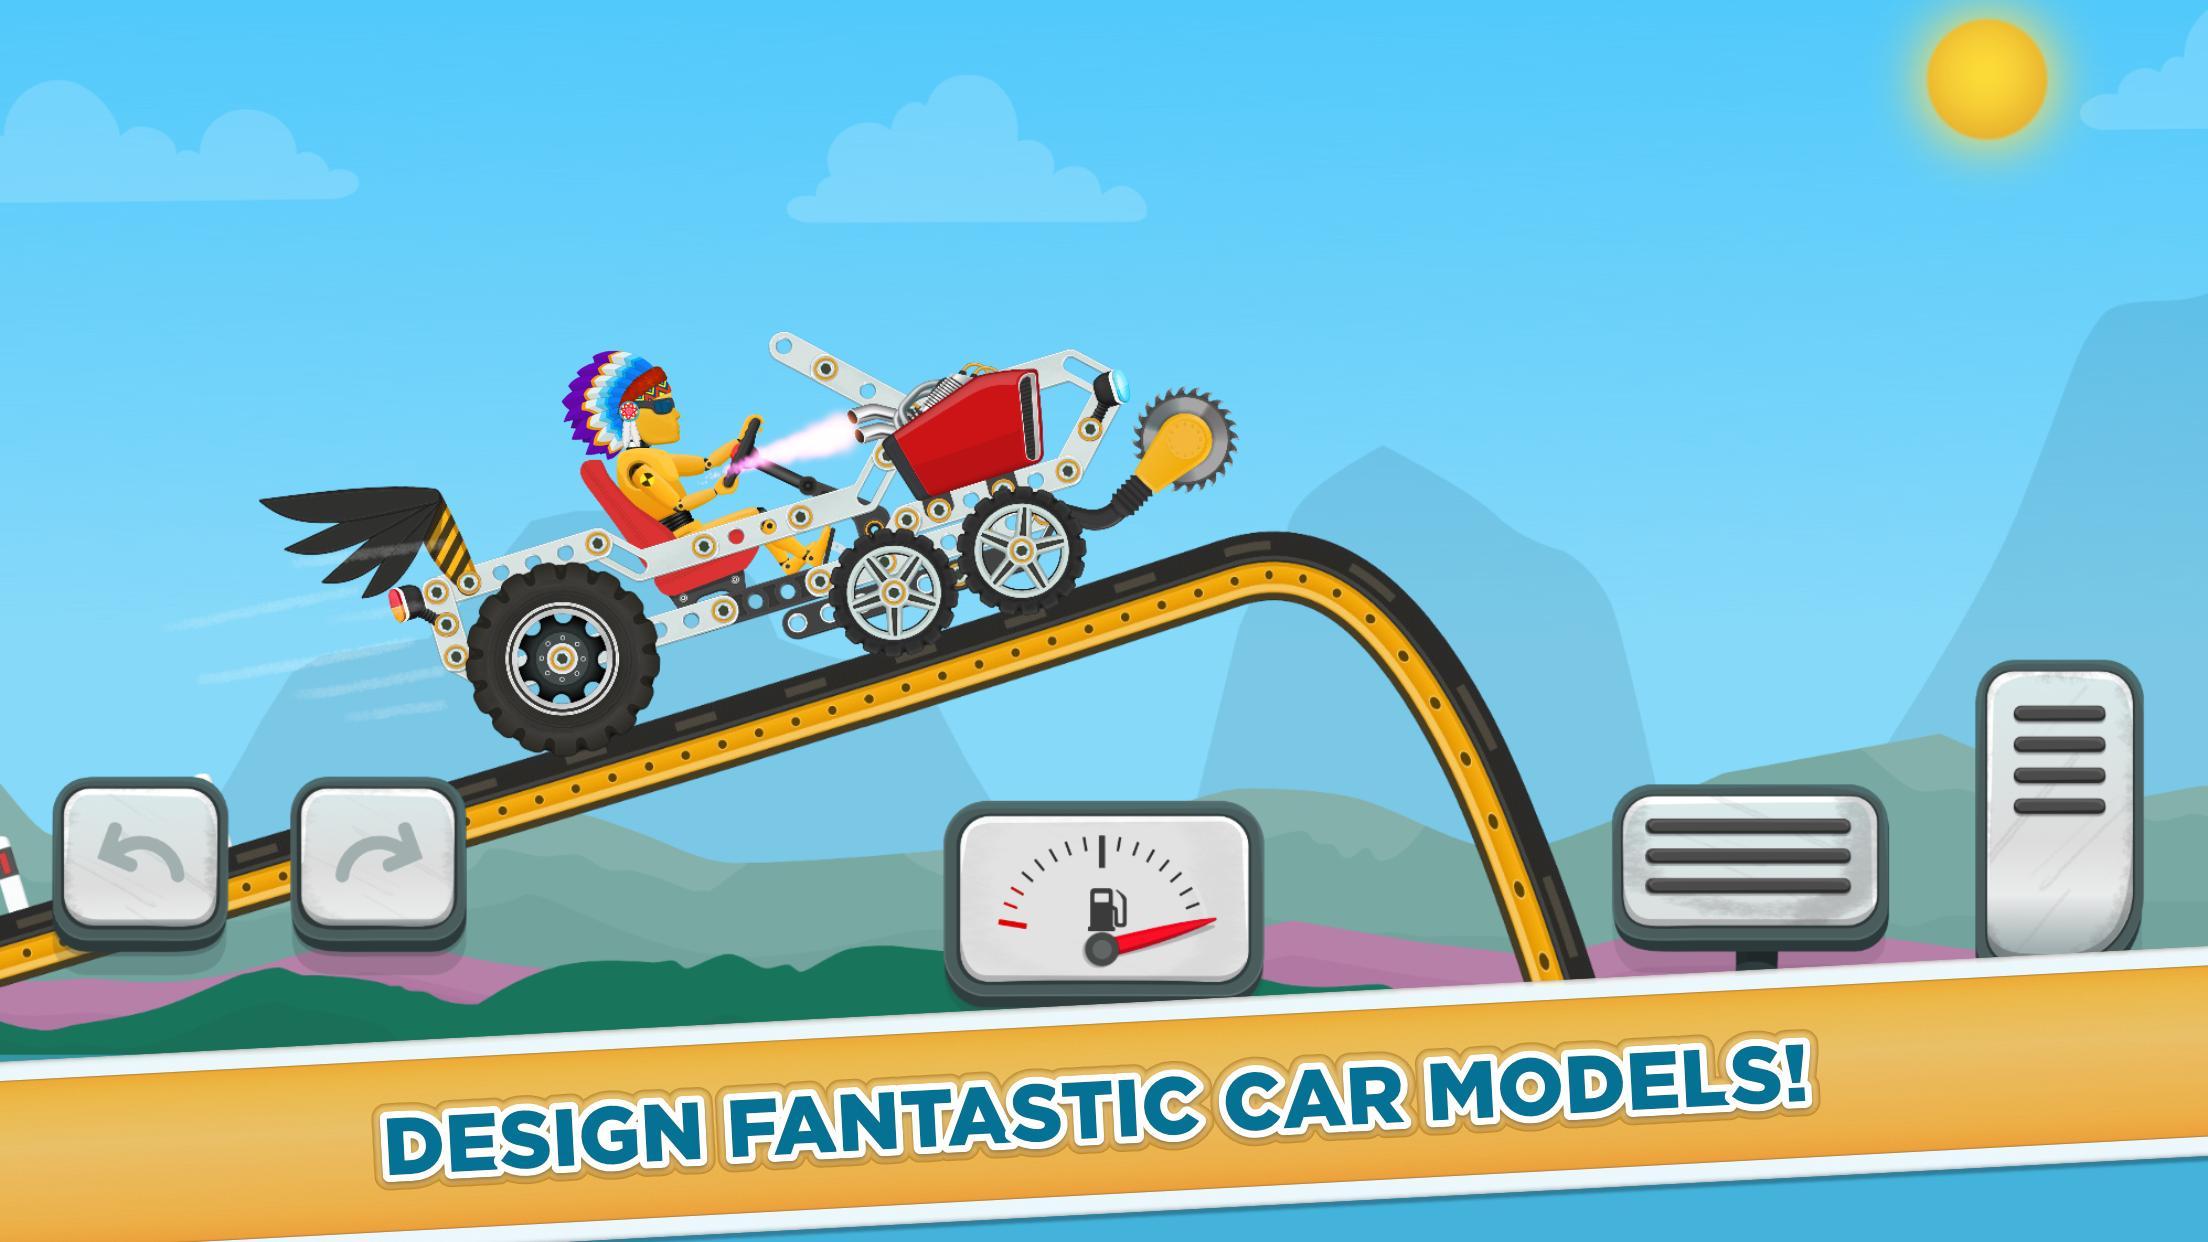 Car Builder and Racing Game for Kids 1.3 Screenshot 1